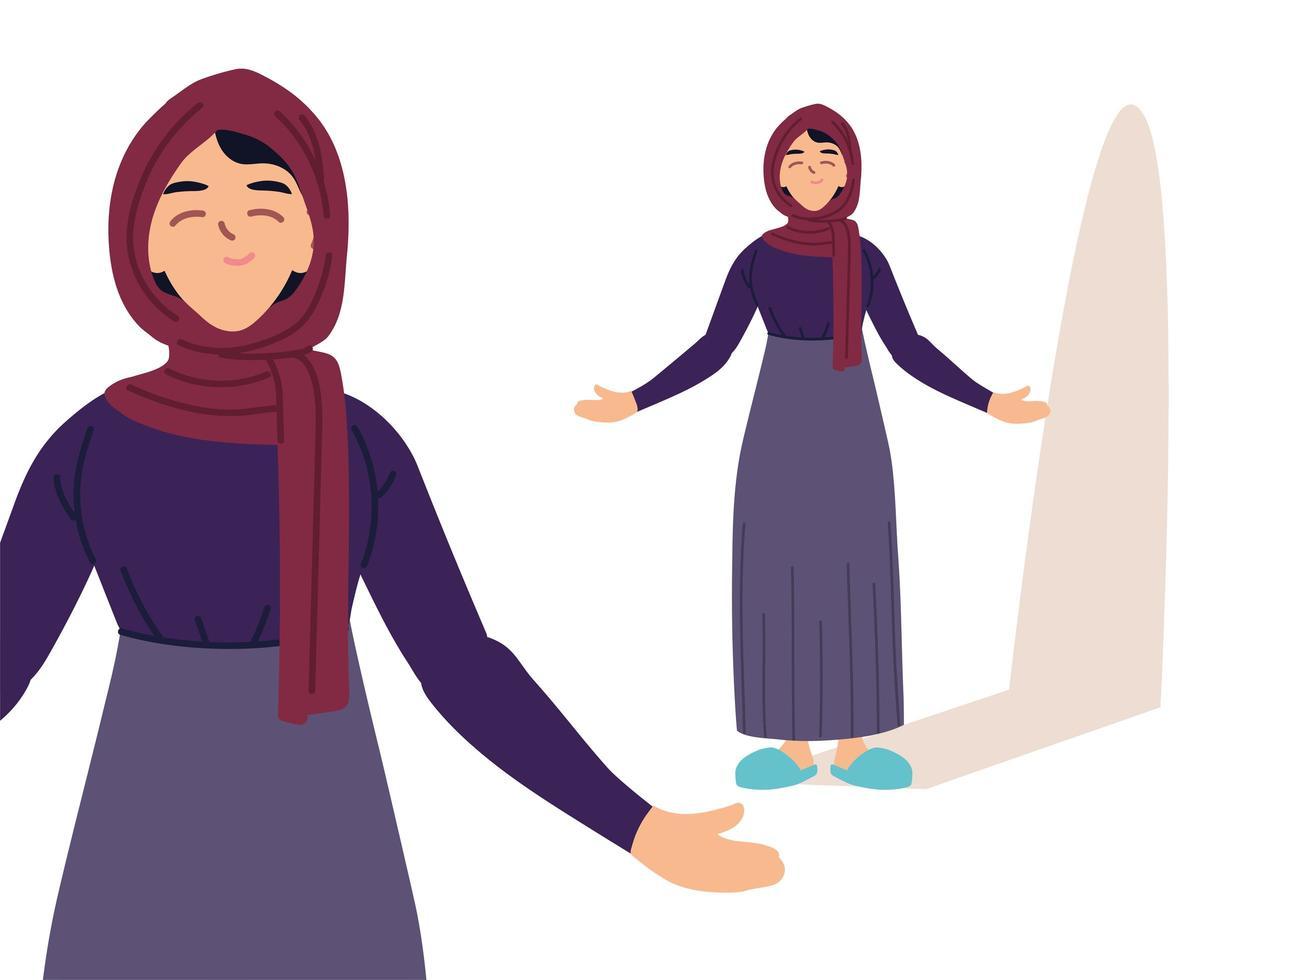 mujer musulmana en diferentes poses vector